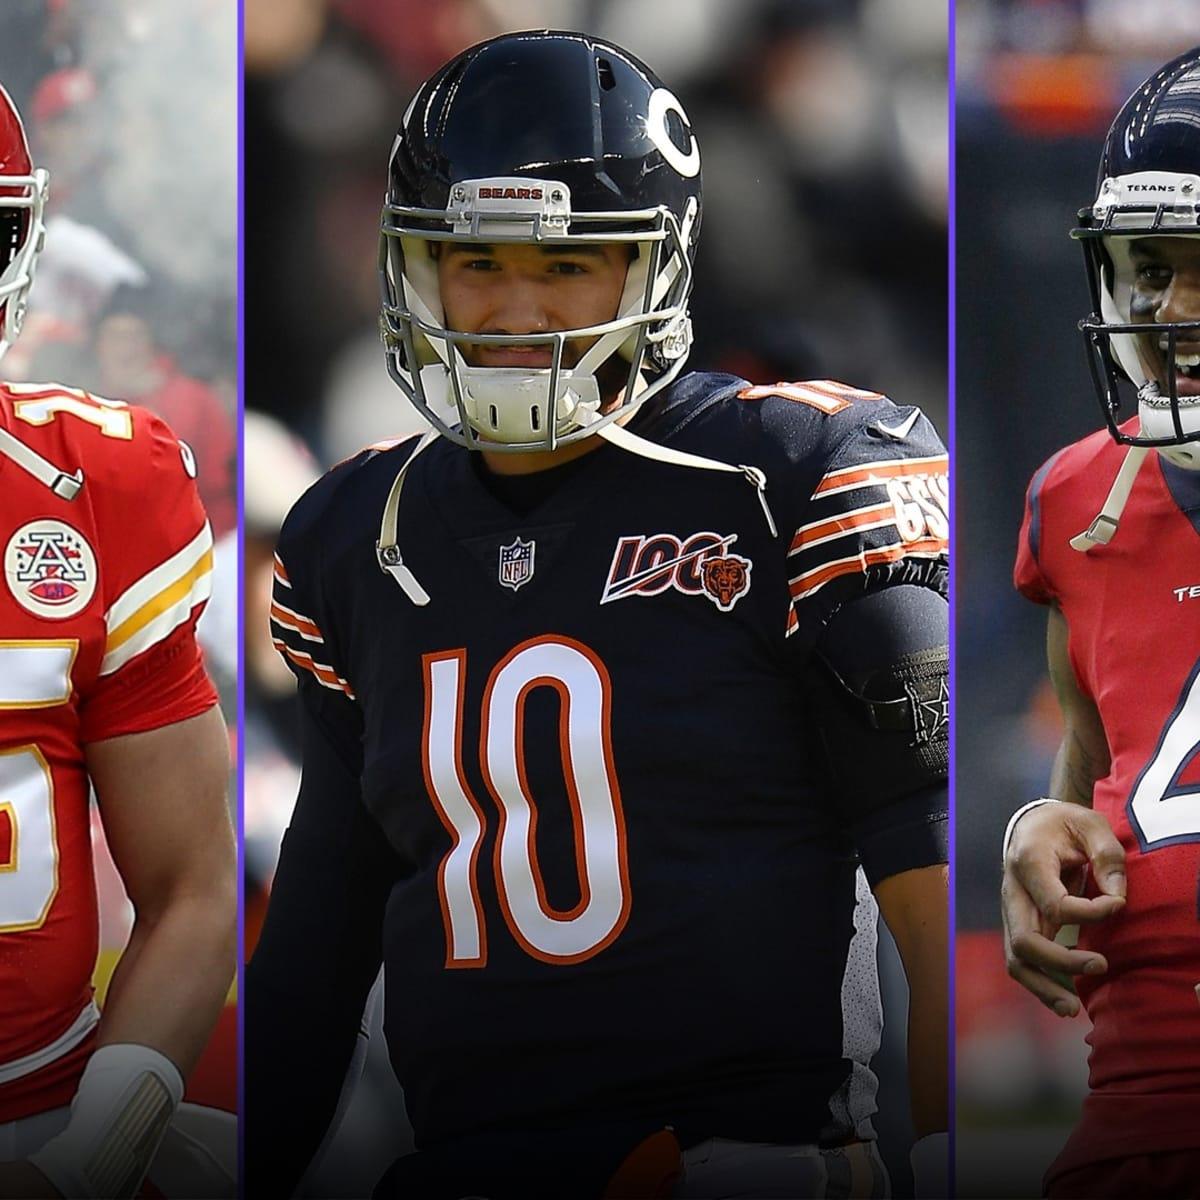 If The Chicago Bears Has Drafted Deshaun Watson? QB Despair for ...